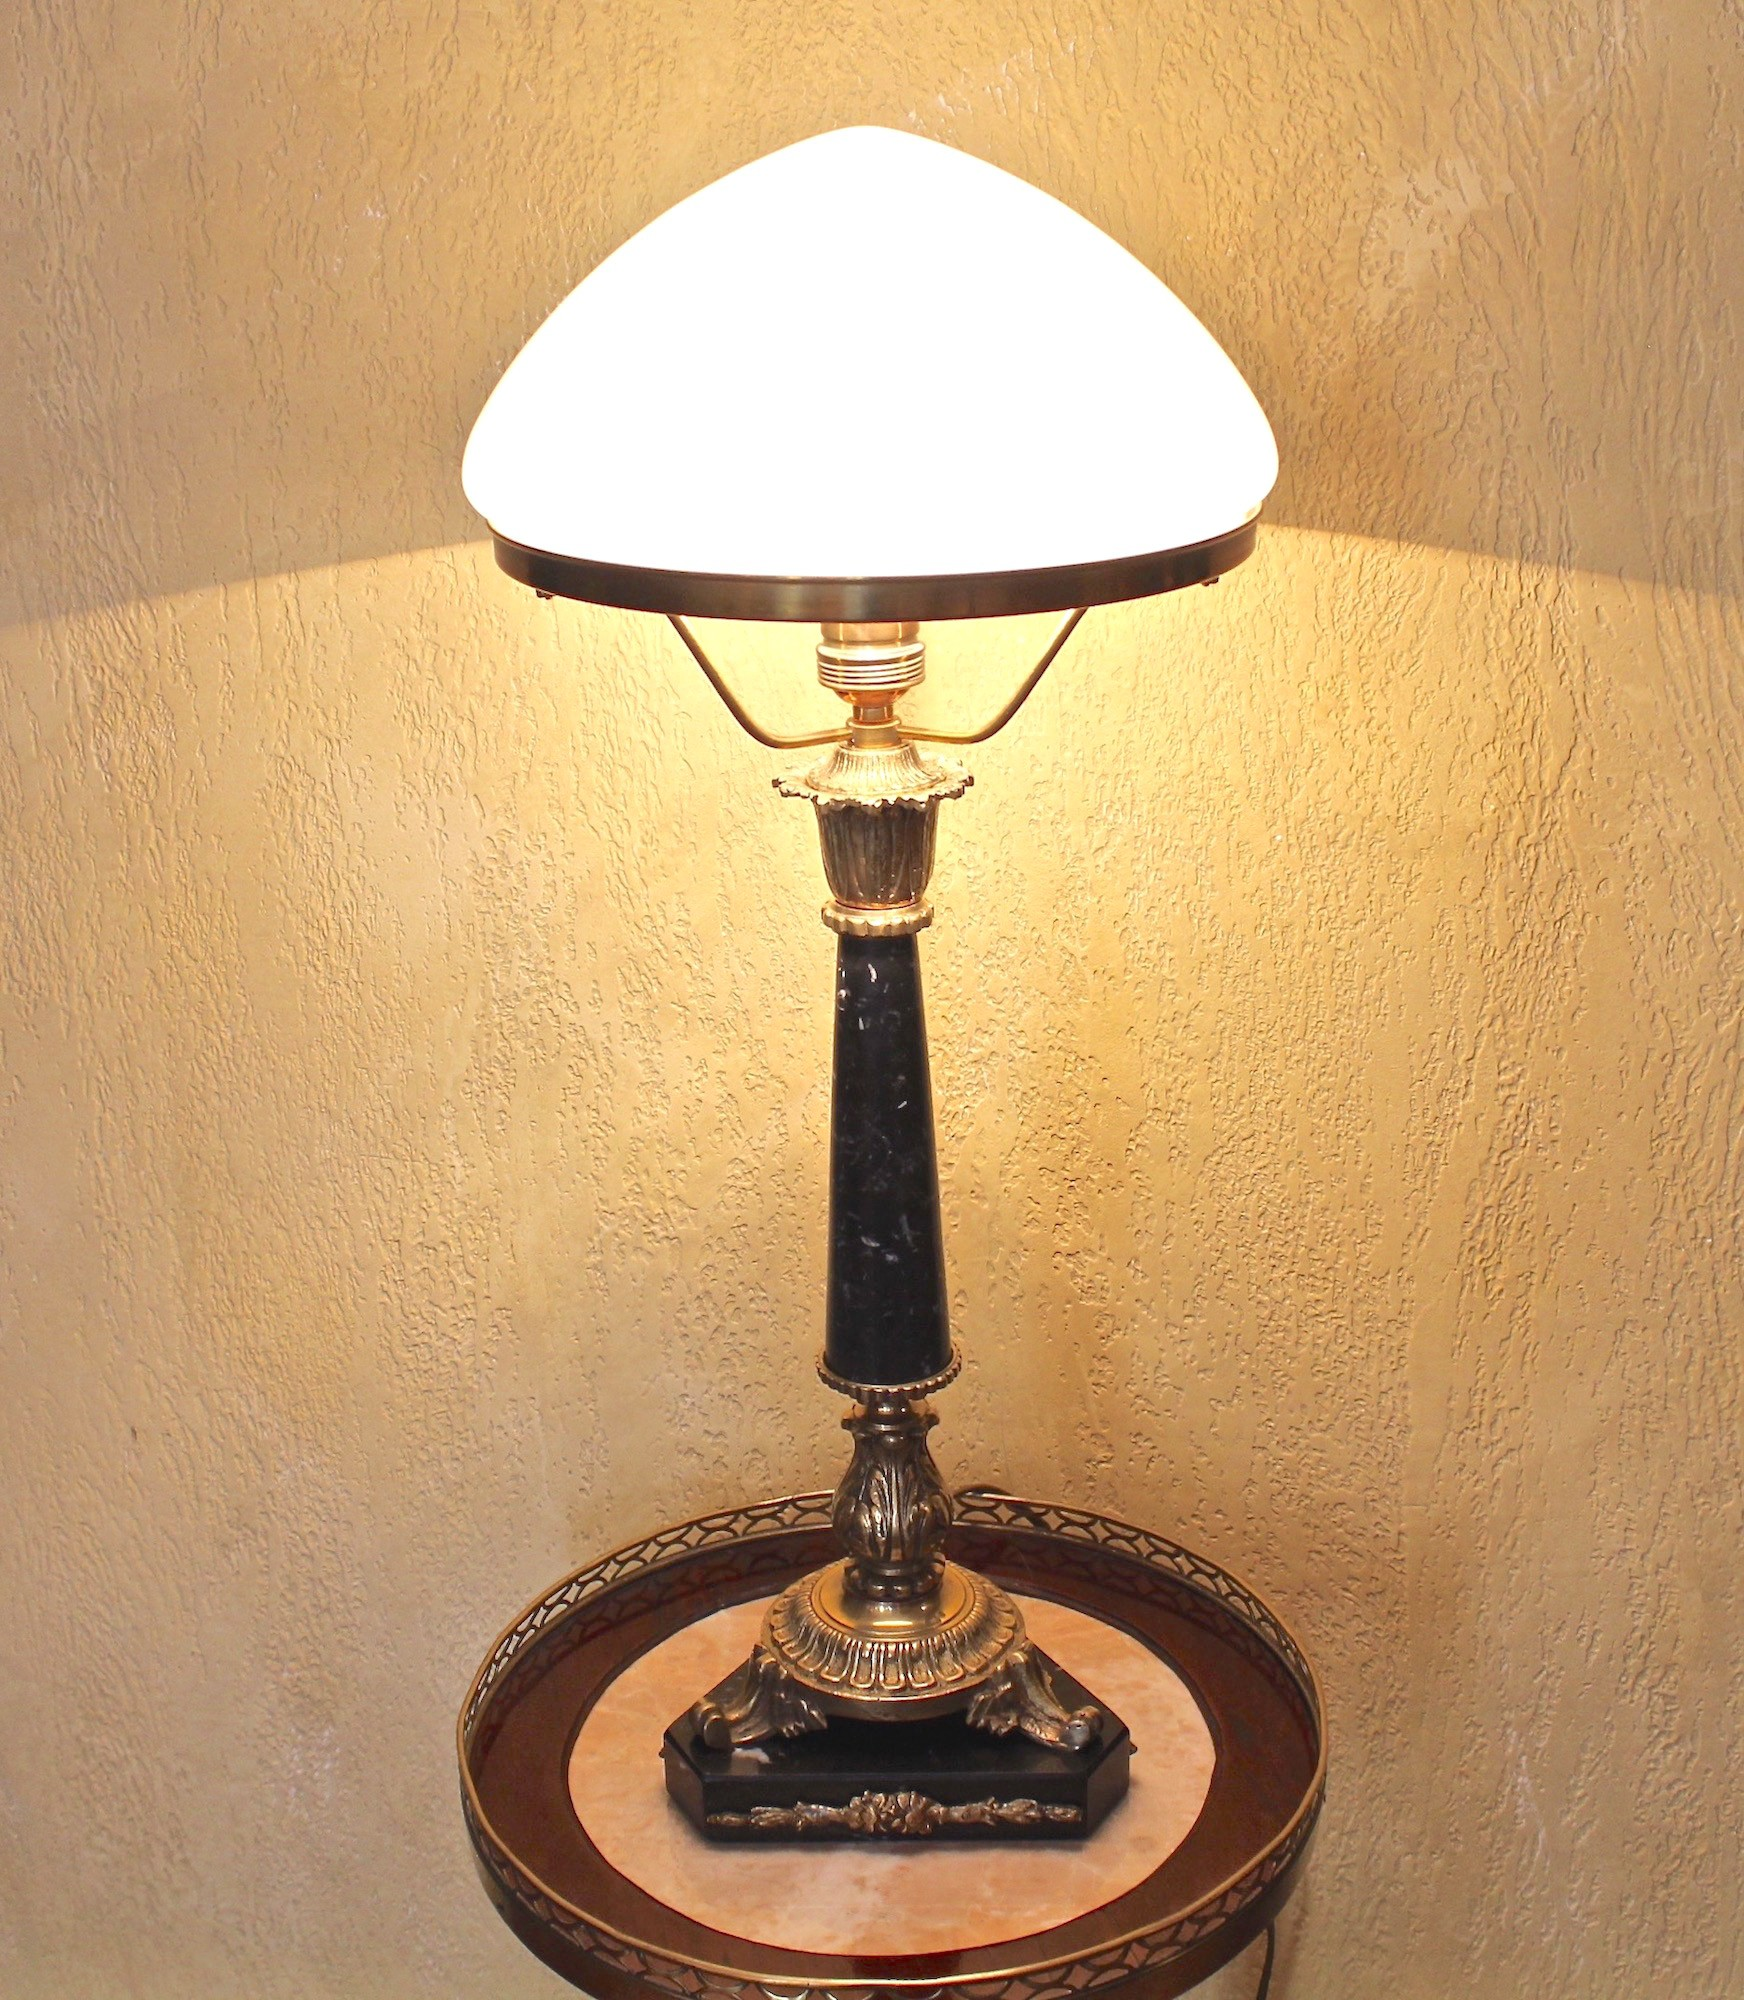 Антикварная настольная лампа в стиле Ампир